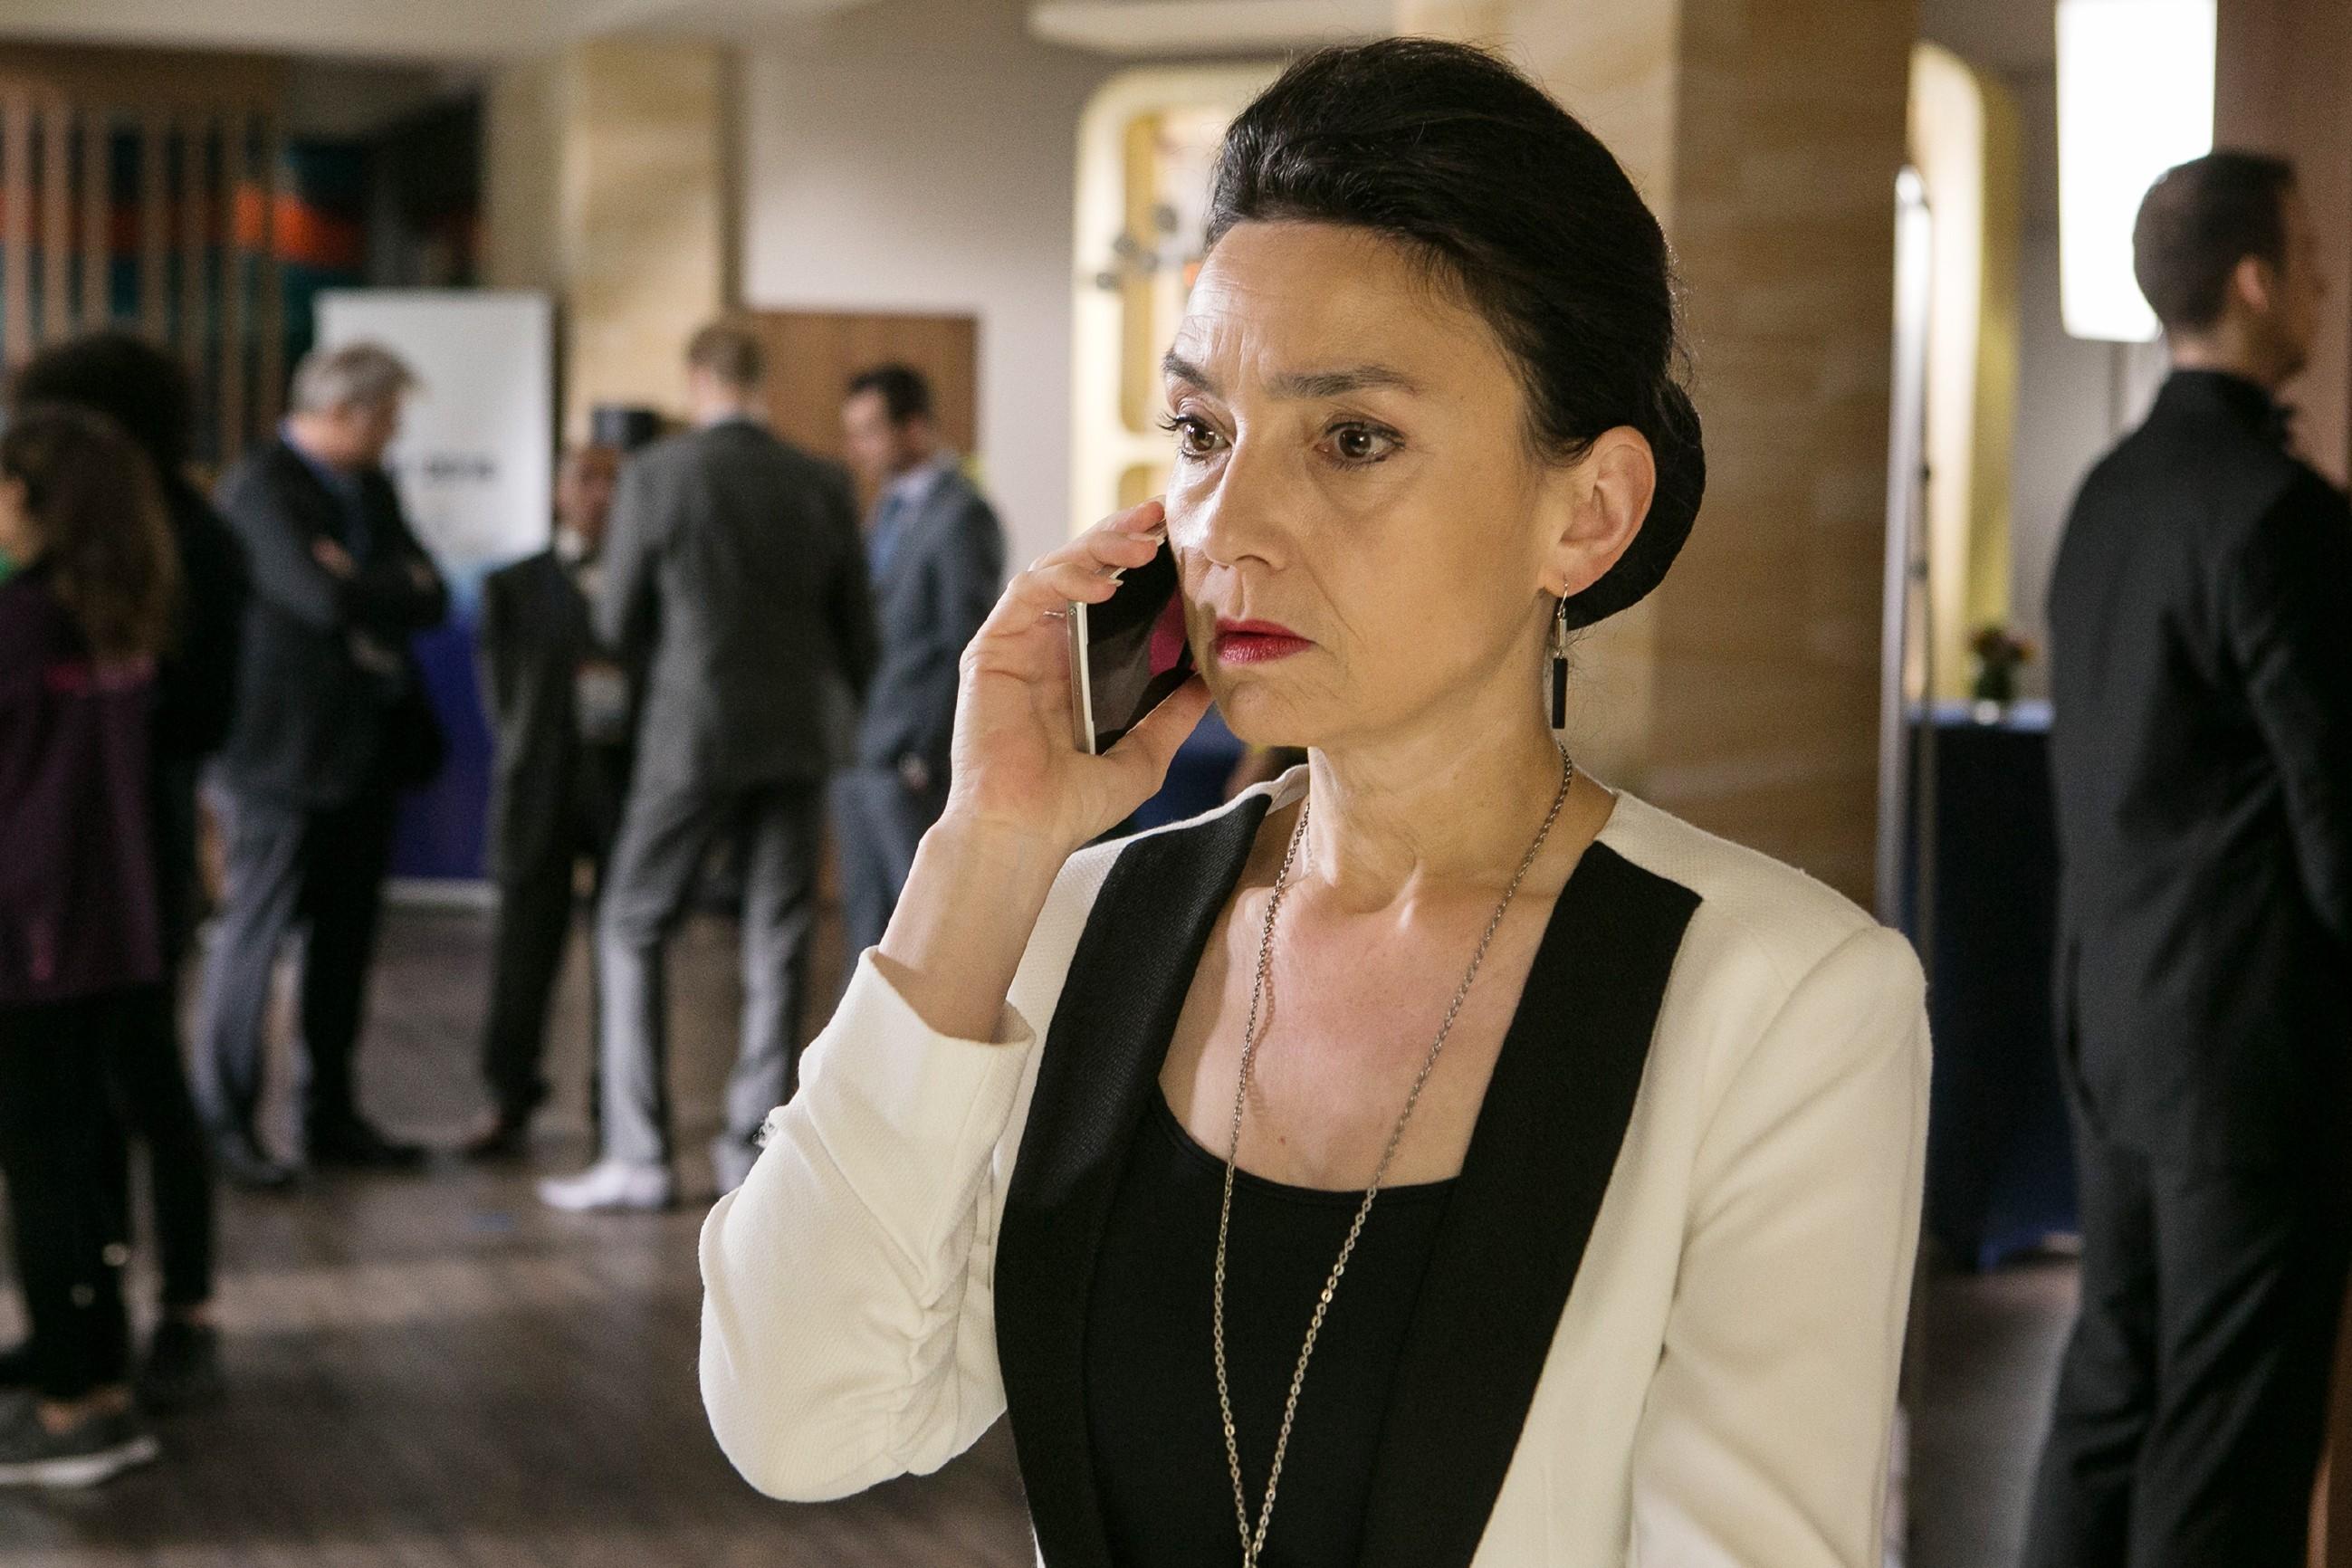 Simone (Tatjana Clasing) erfährt geschockt, dass gegen Richard in Russland Anklage erhoben wurde. (Quelle: RTL / Kai Schulz)